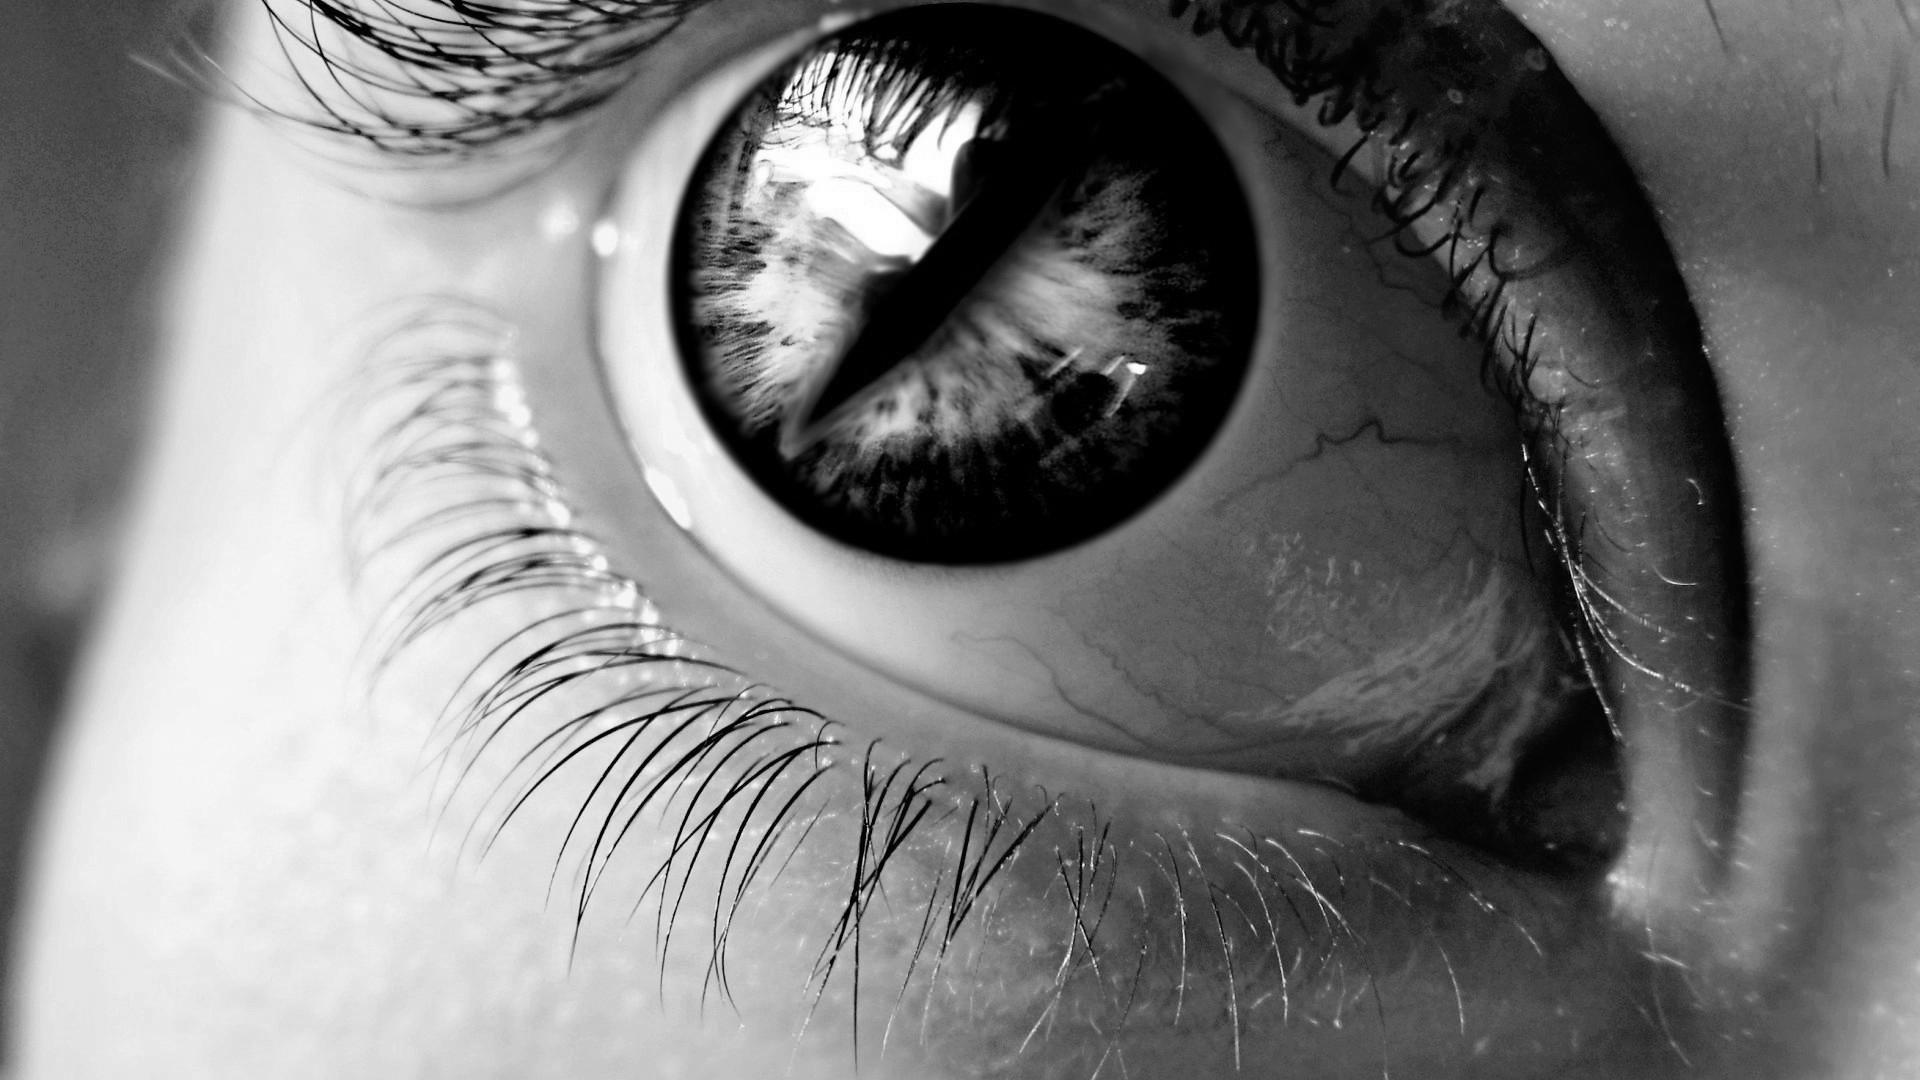 Women eyes monochrome eyelashes hd wallpapers desktop and mobile images photos - Eye drawing wallpaper ...